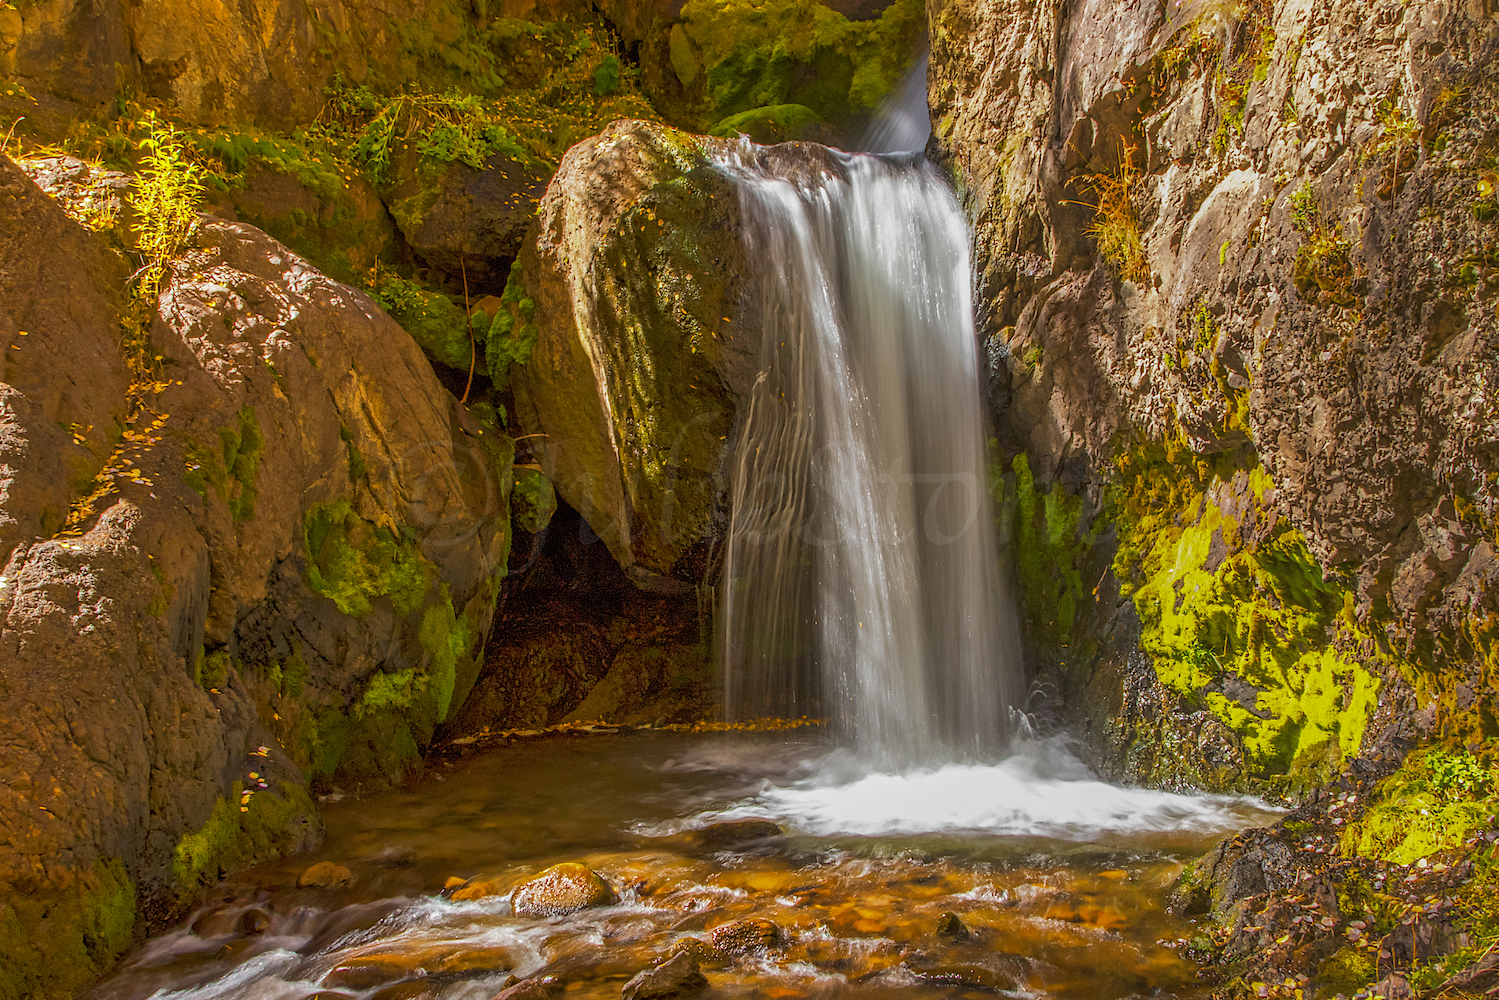 Nellie Creek Falls, Image # 5606